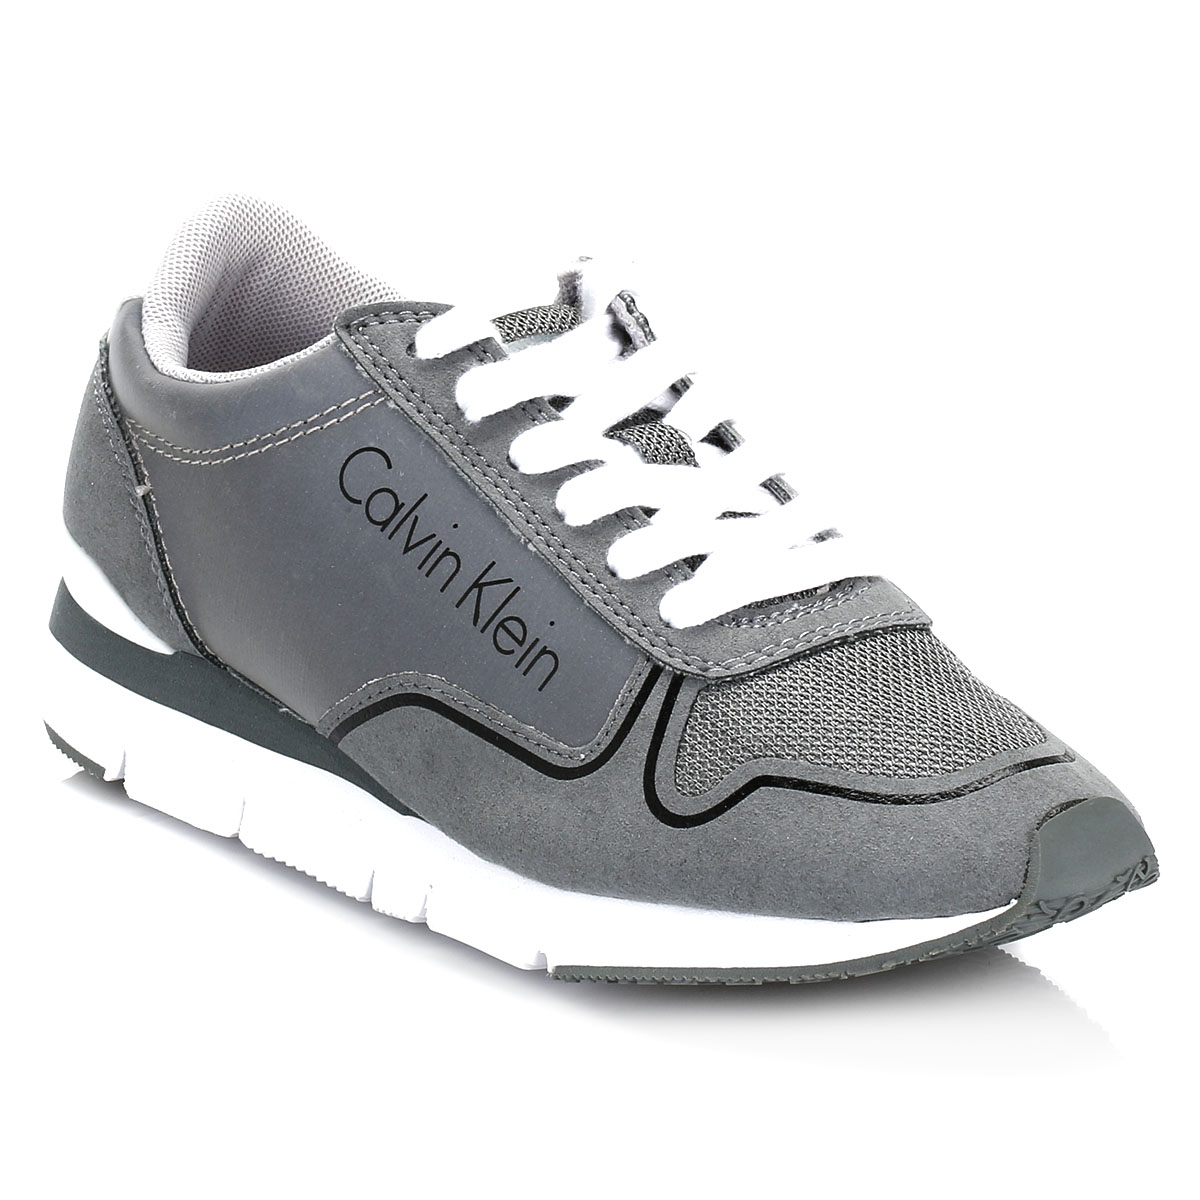 ck calvin klein sport shoes style guru fashion glitz. Black Bedroom Furniture Sets. Home Design Ideas